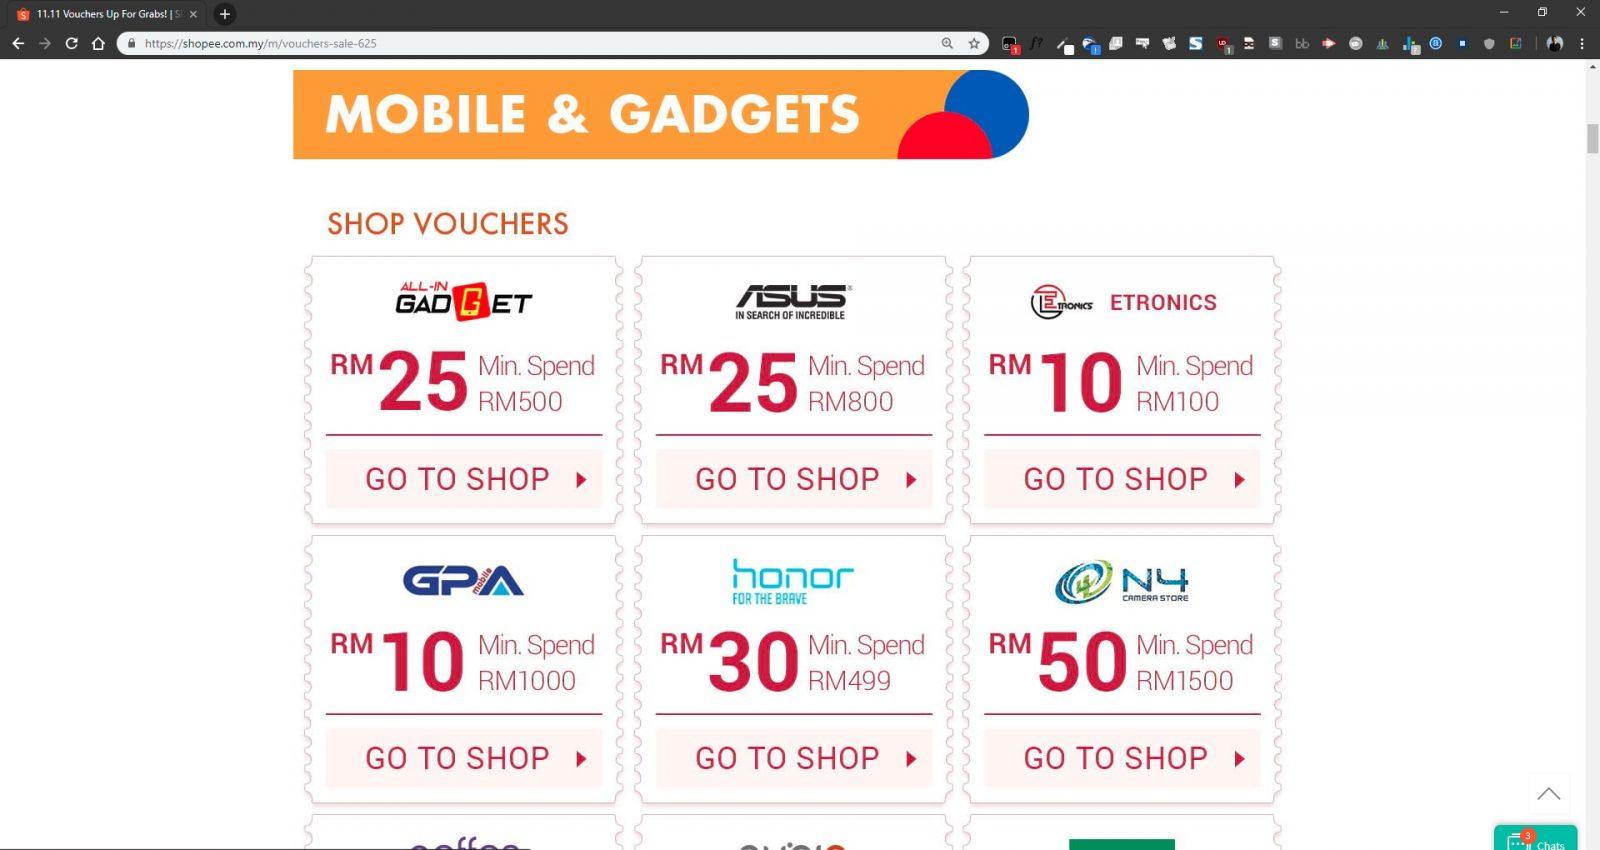 shopee 1111 voucher malaysia